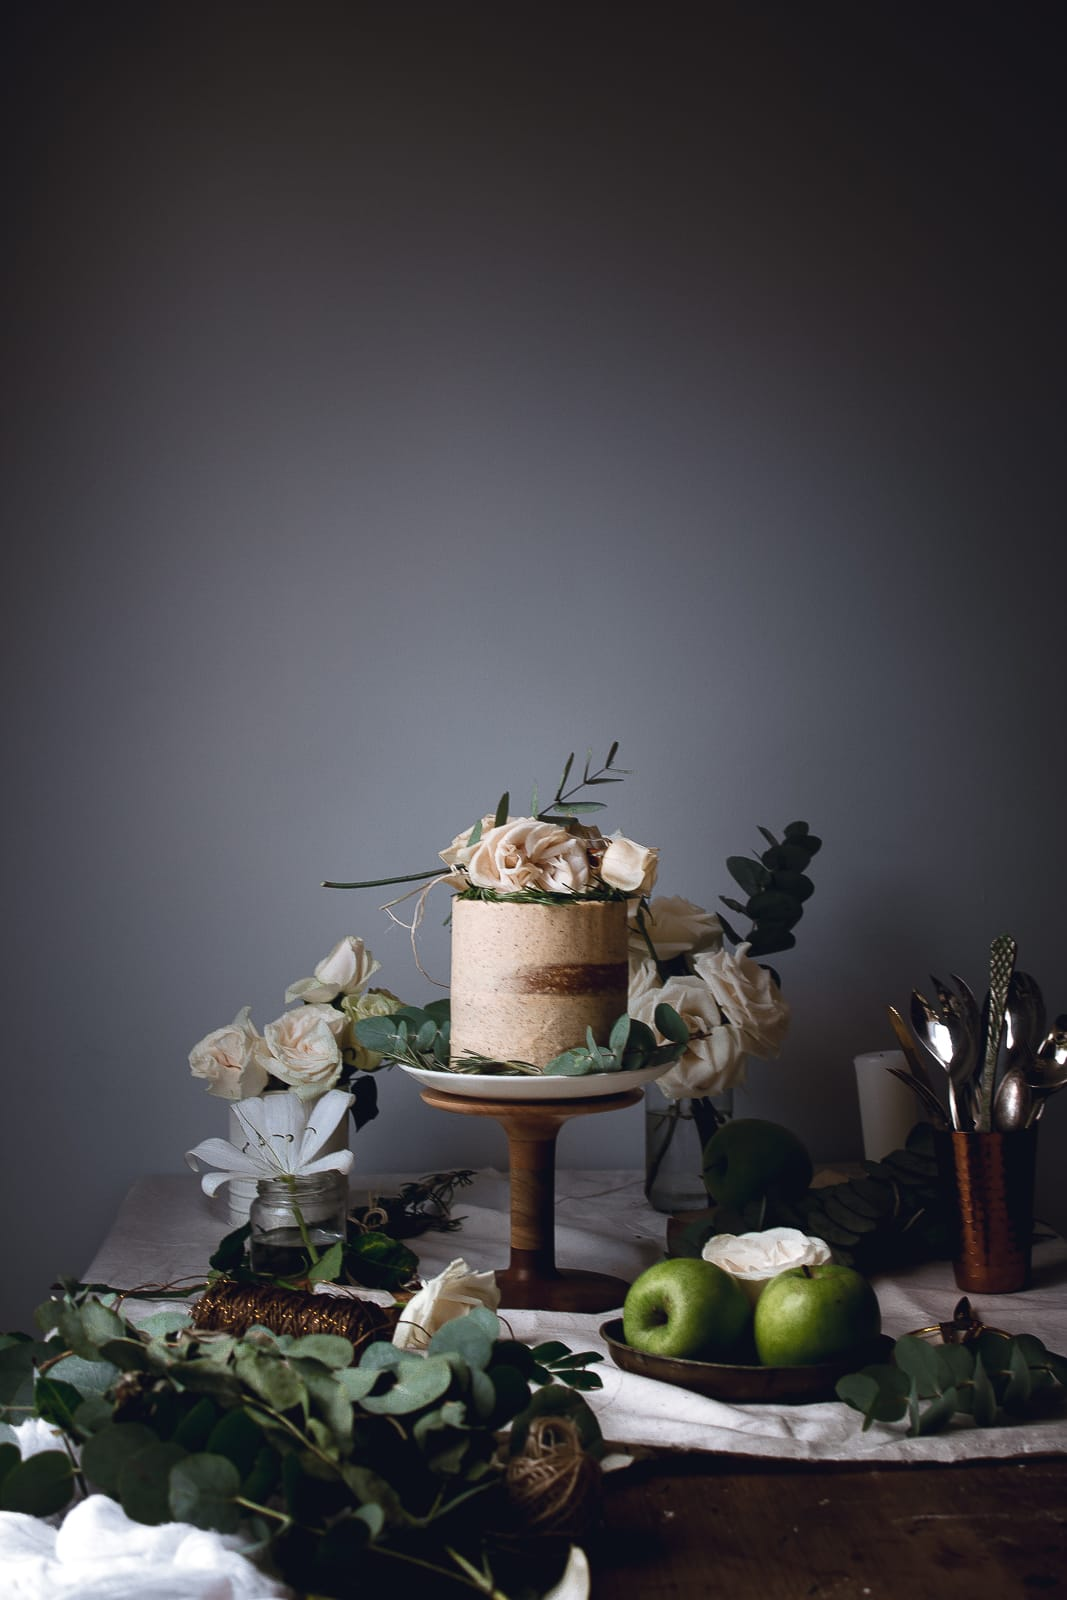 gingerbread-apple-cake-4412